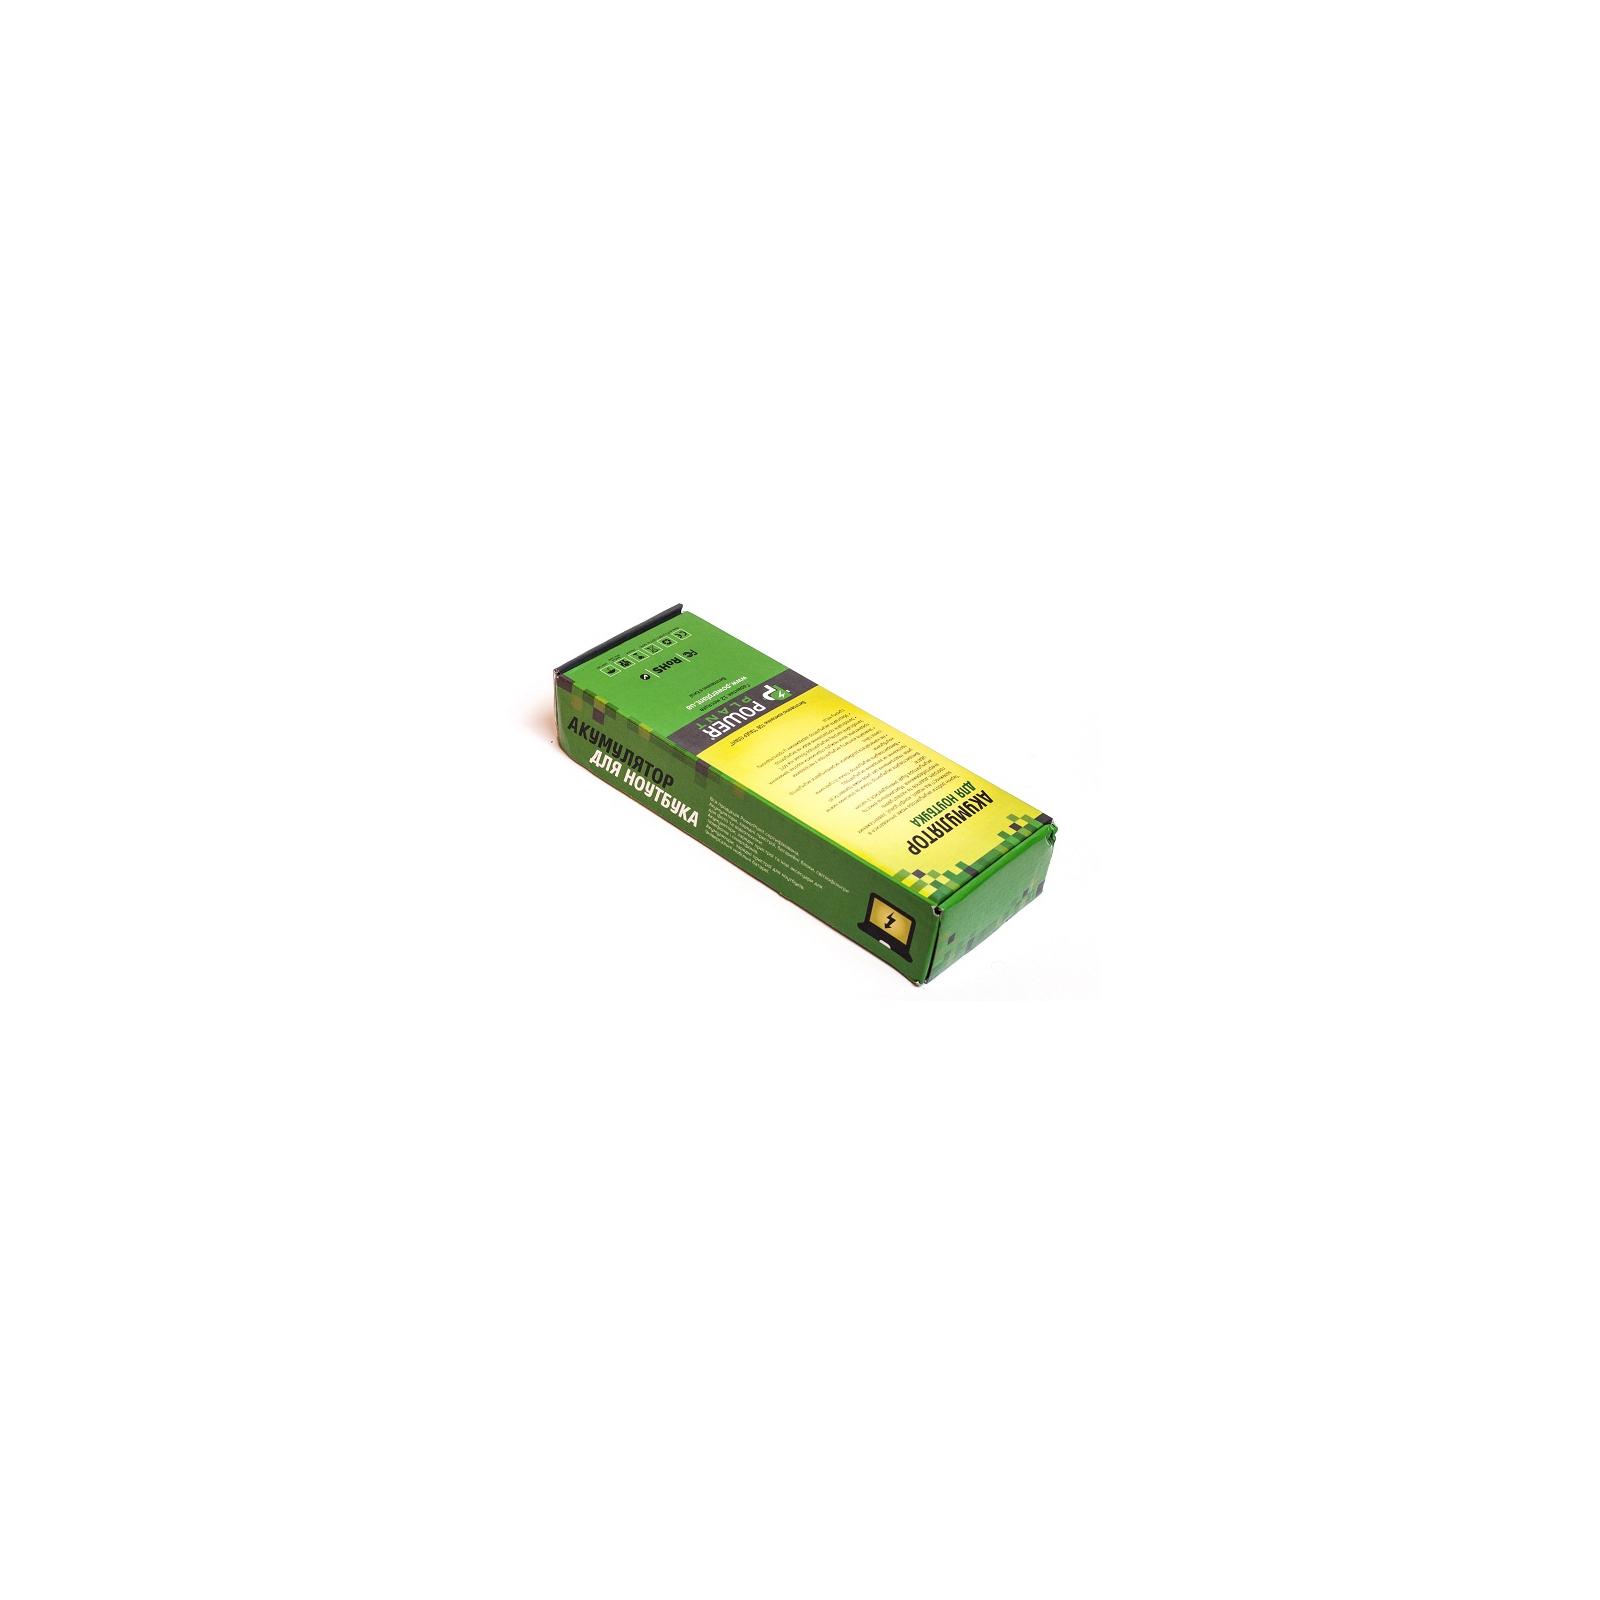 Аккумулятор для ноутбука CASPER TW8 Series (SQU-804, UN8040LH) 11.1V 5200mAh PowerPlant (NB00000144) изображение 2